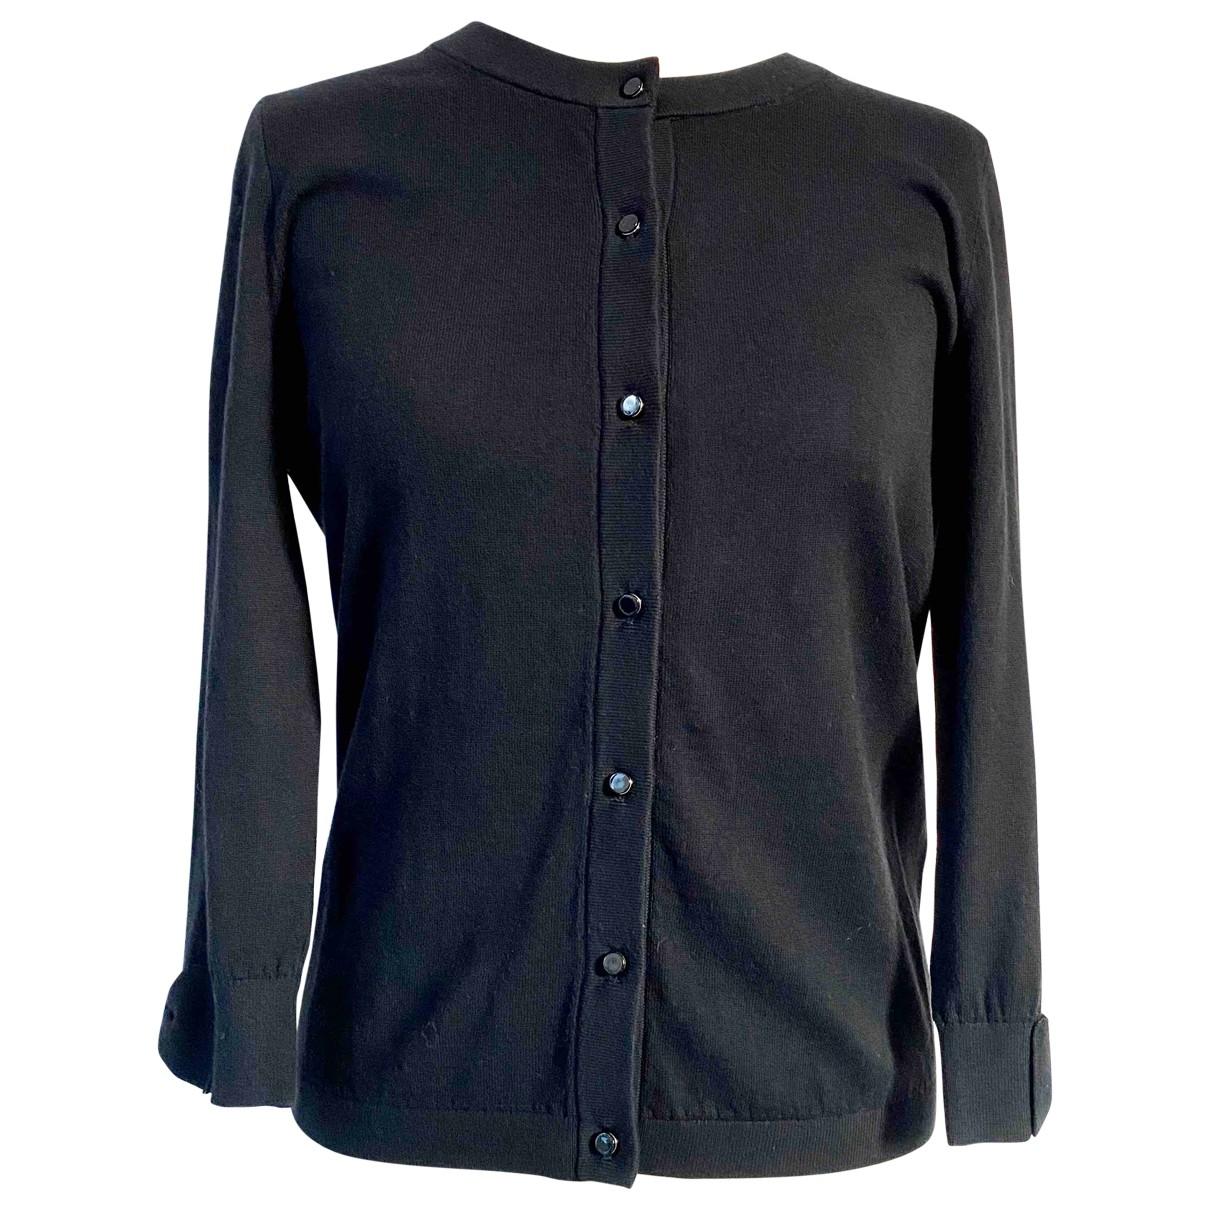 Kate Spade N Black Cotton Knitwear for Women M International